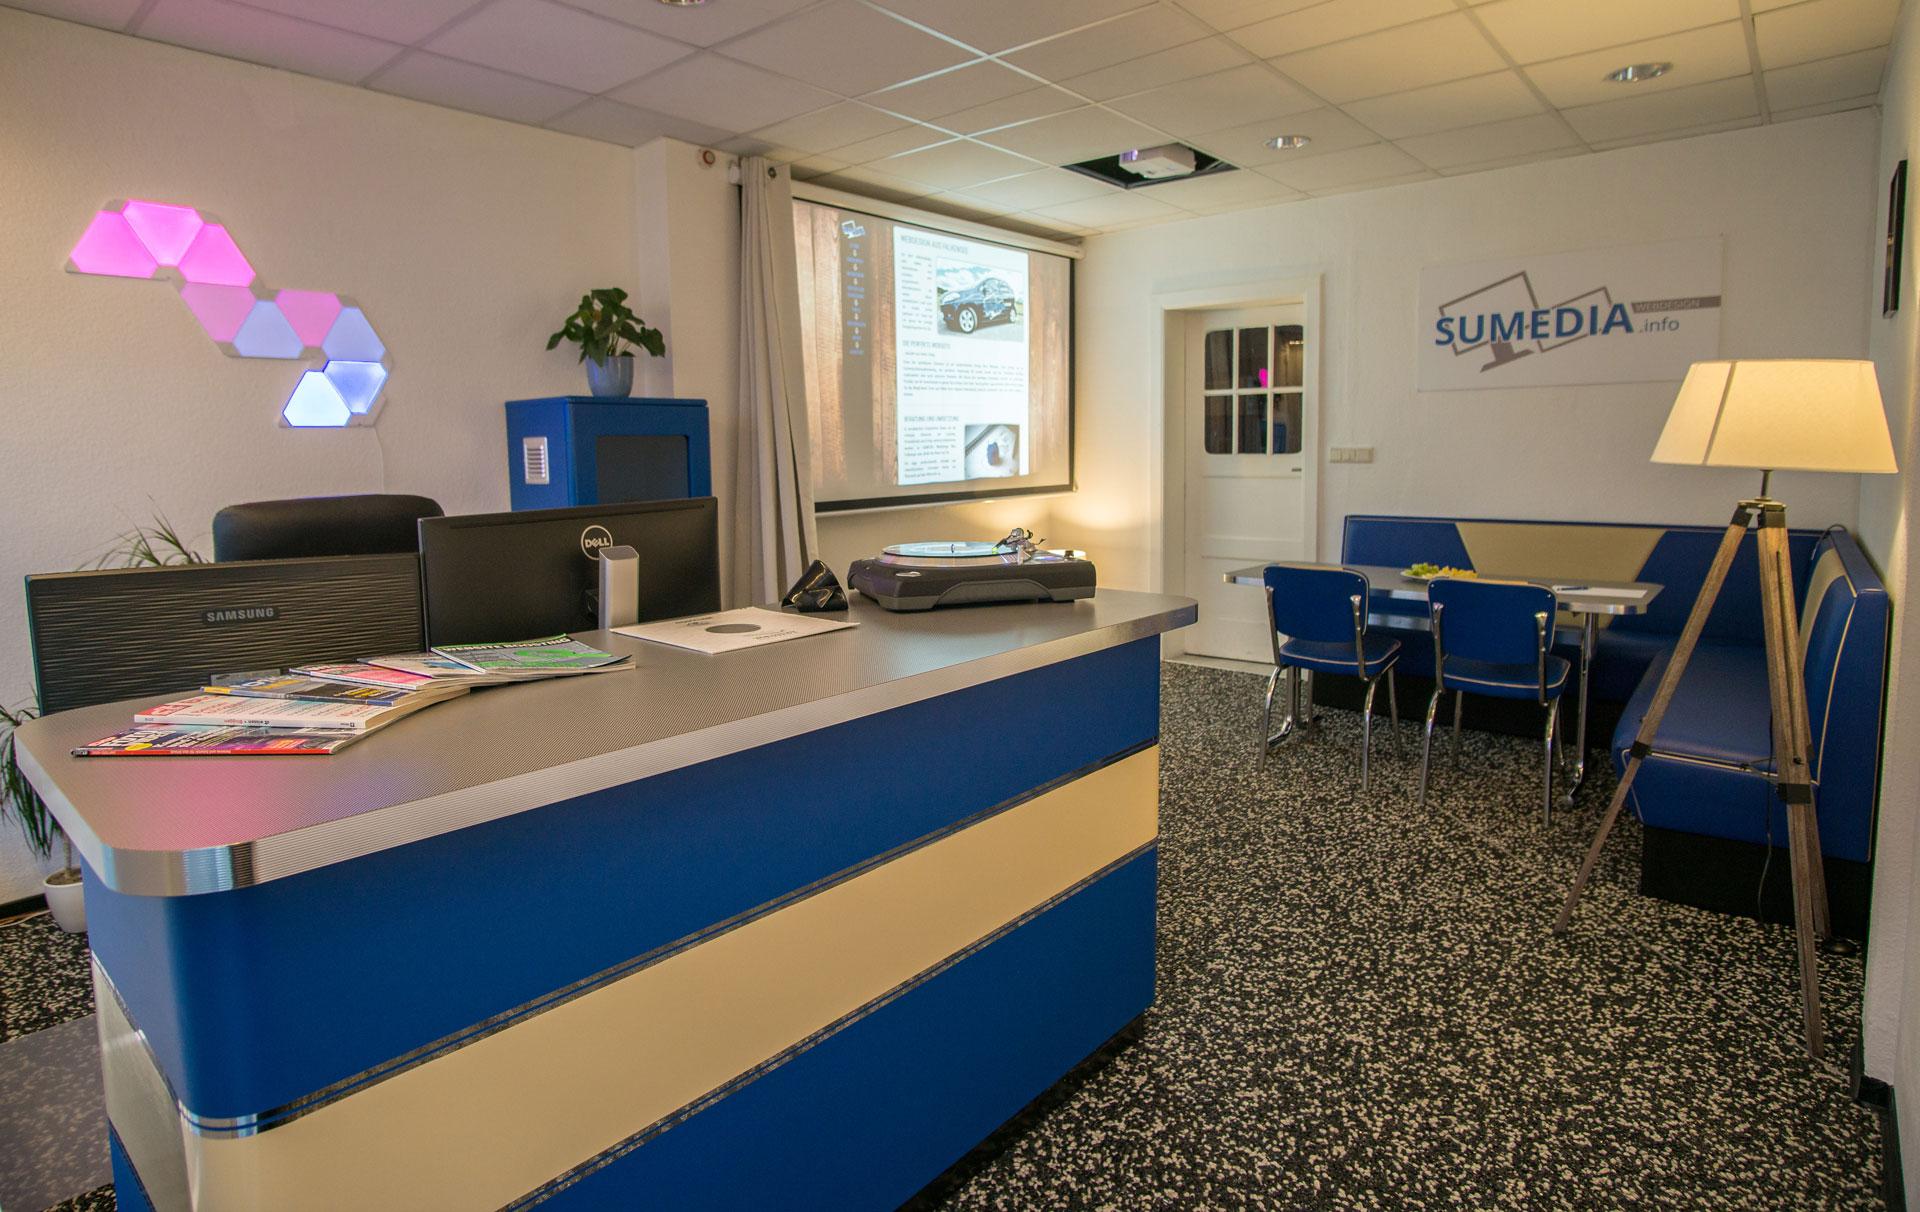 SUMEDIA Webdesign online Marketing Büro Falkensee Eingangsbereich